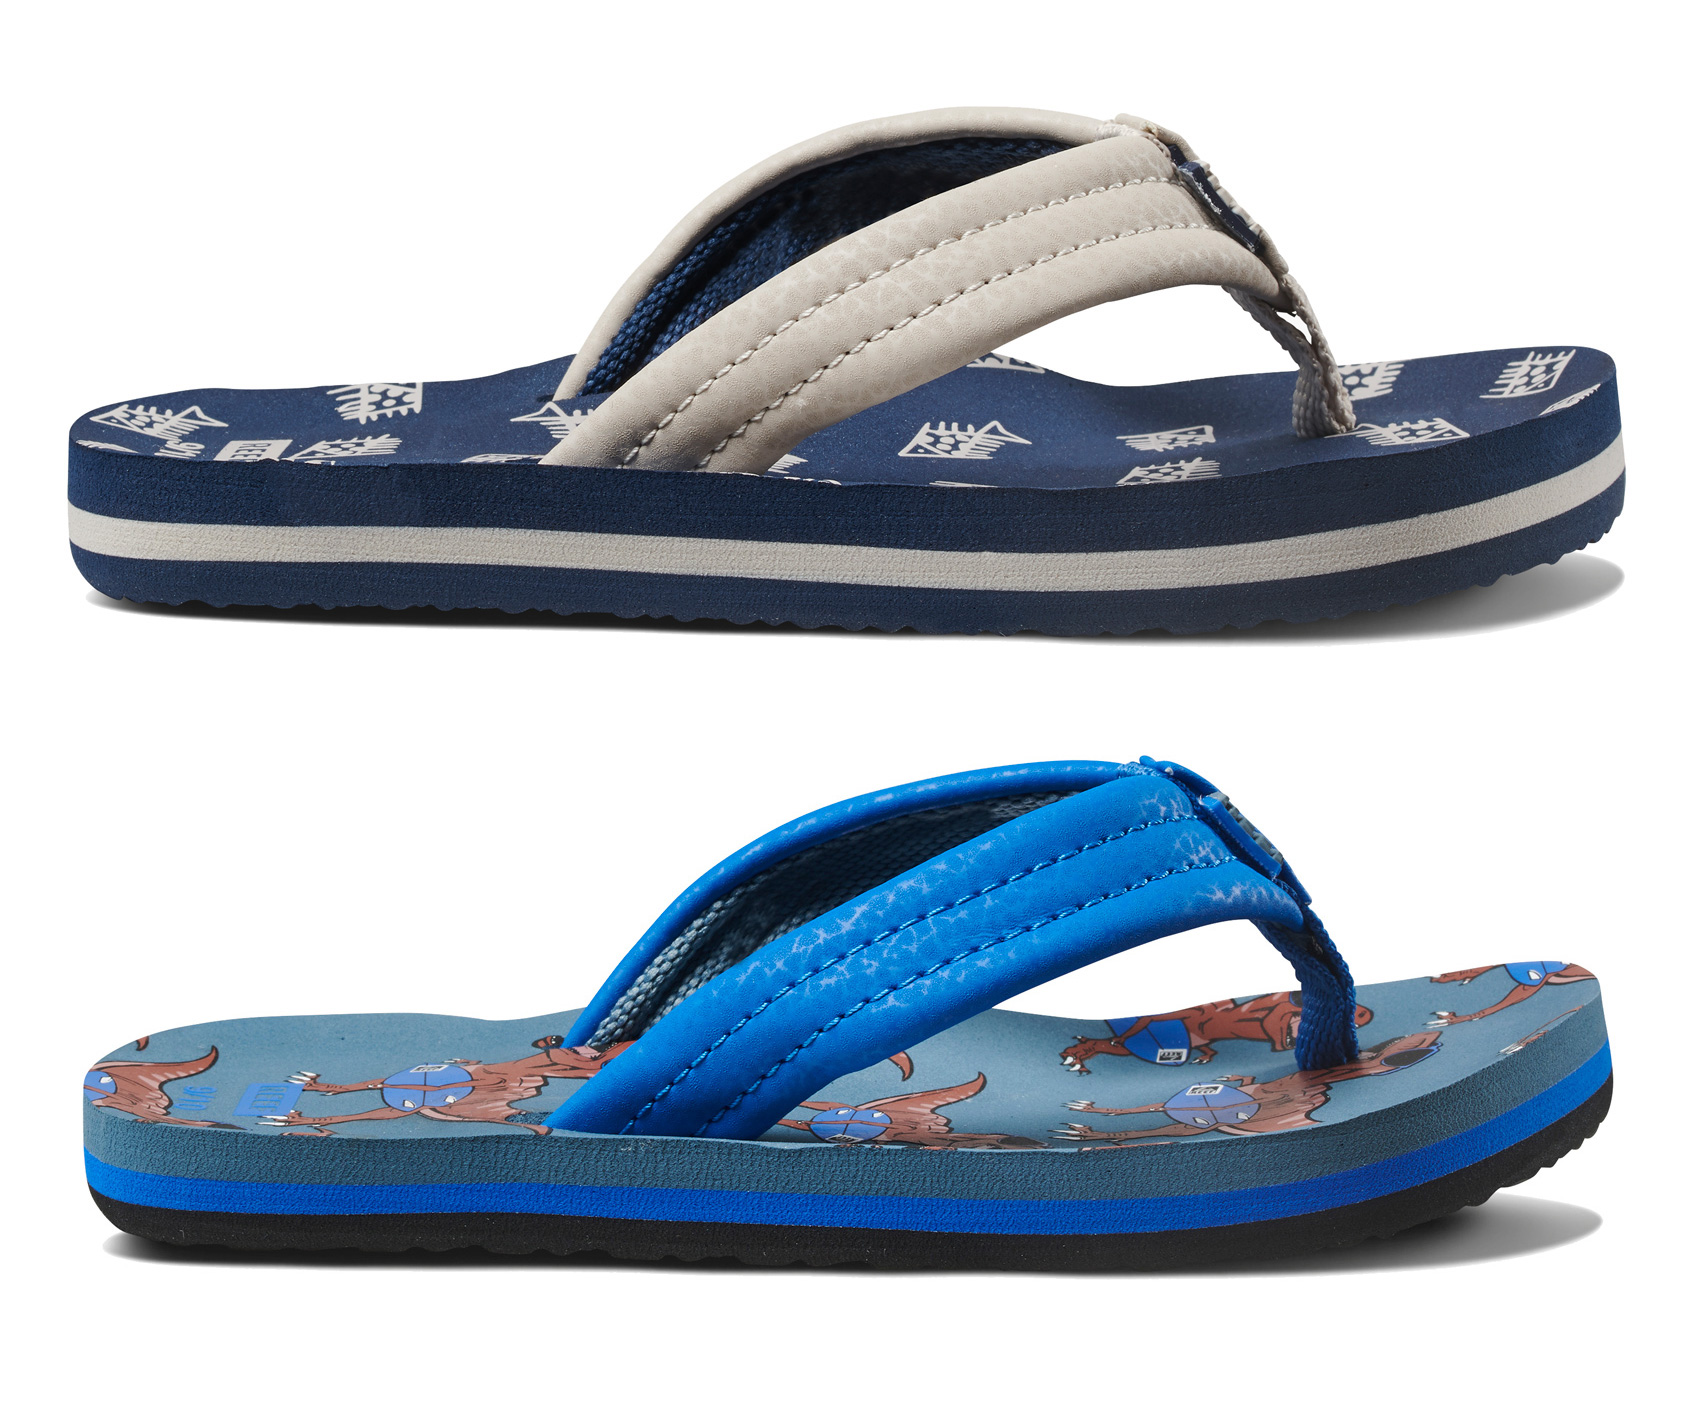 3db0fa33e899 Sentinel Reef Kids Flip Flops - Ahi - Boys